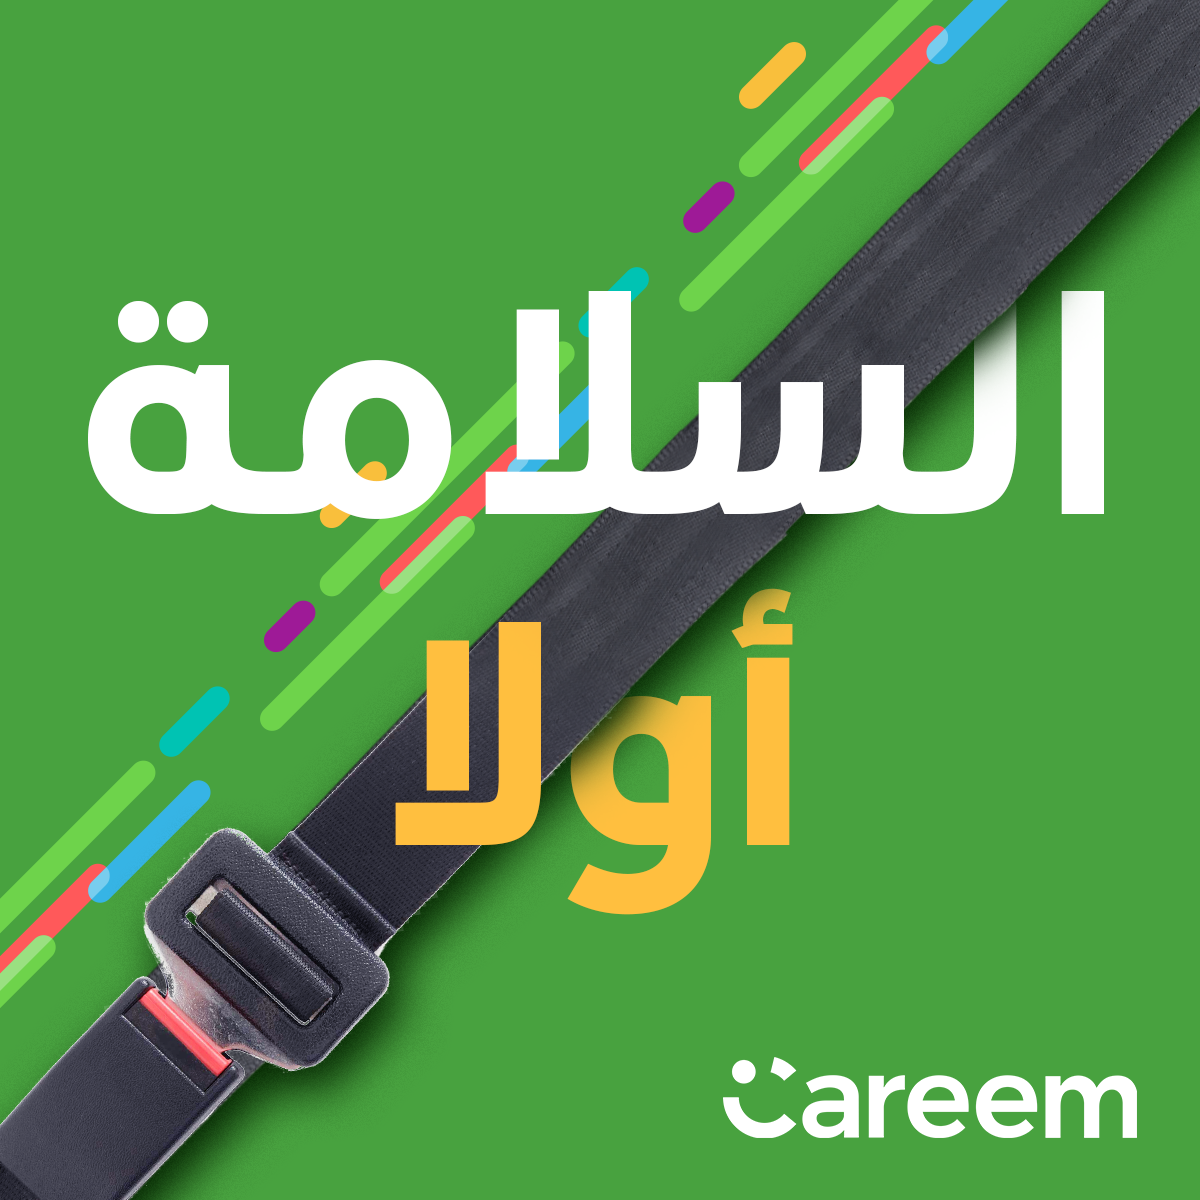 Careem-3